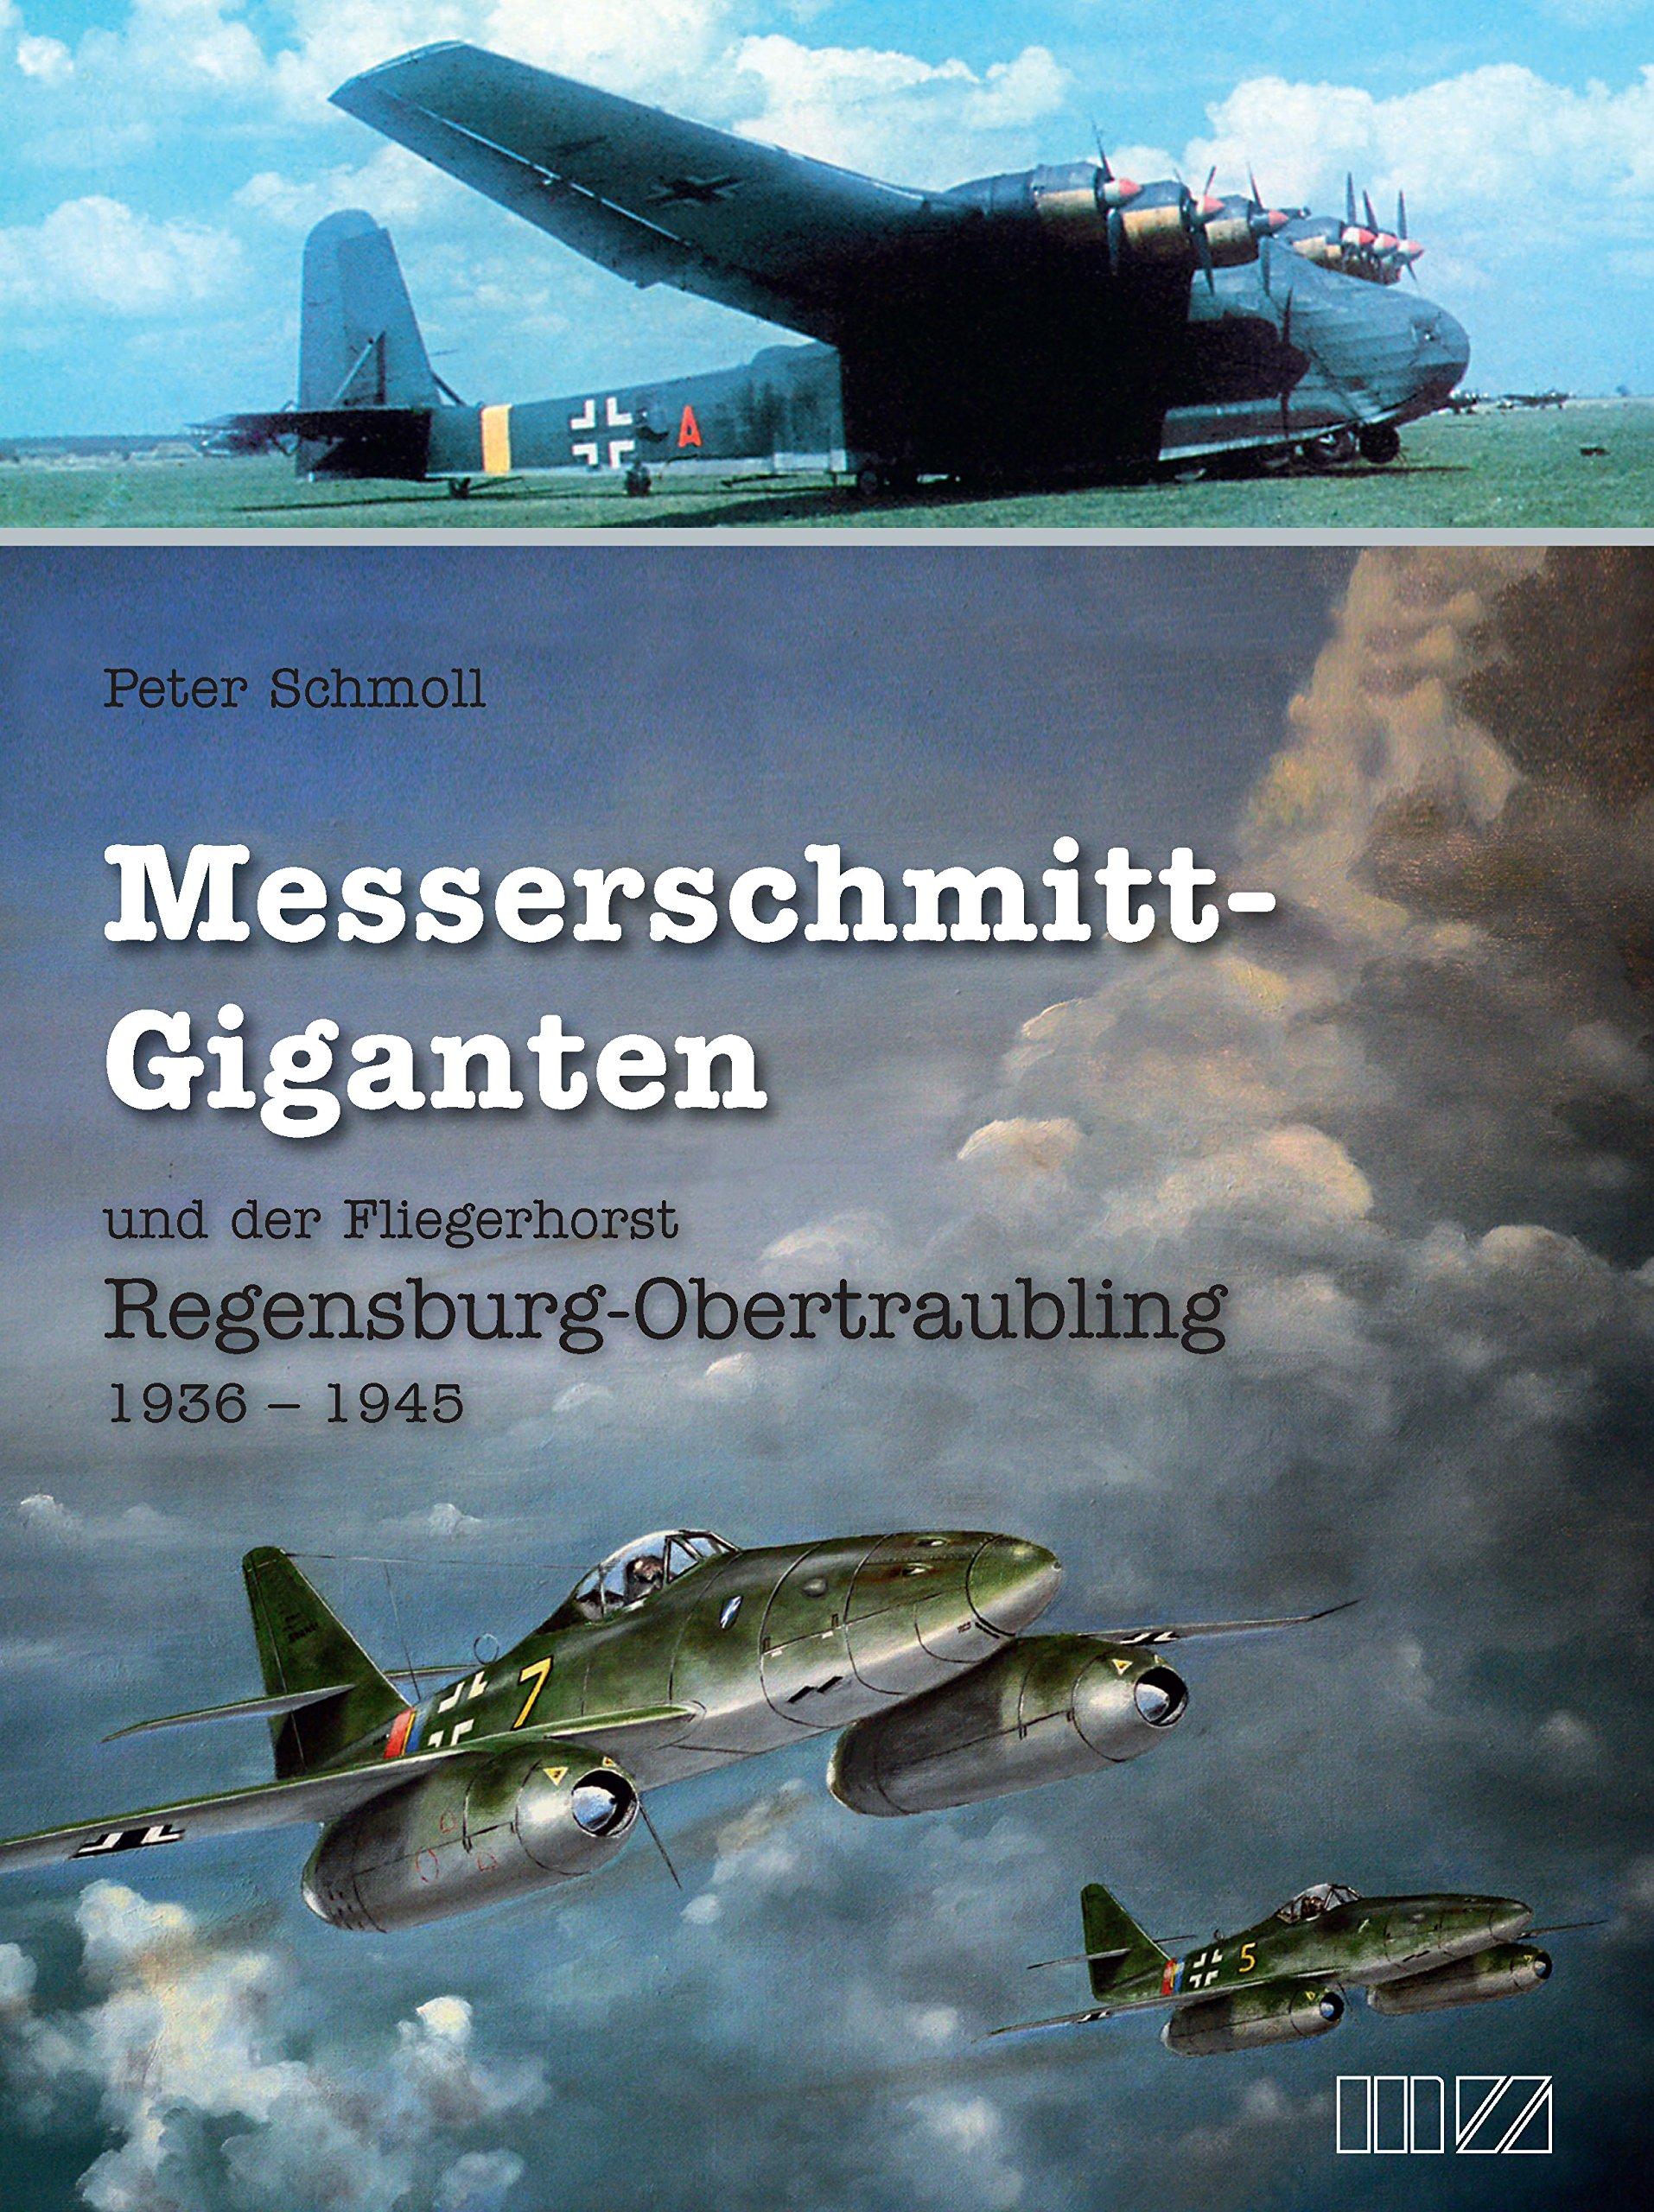 Messerschmitt-Giganten: und der Fliegerhorst Regensburg-Obertraubling 1936 - 1945